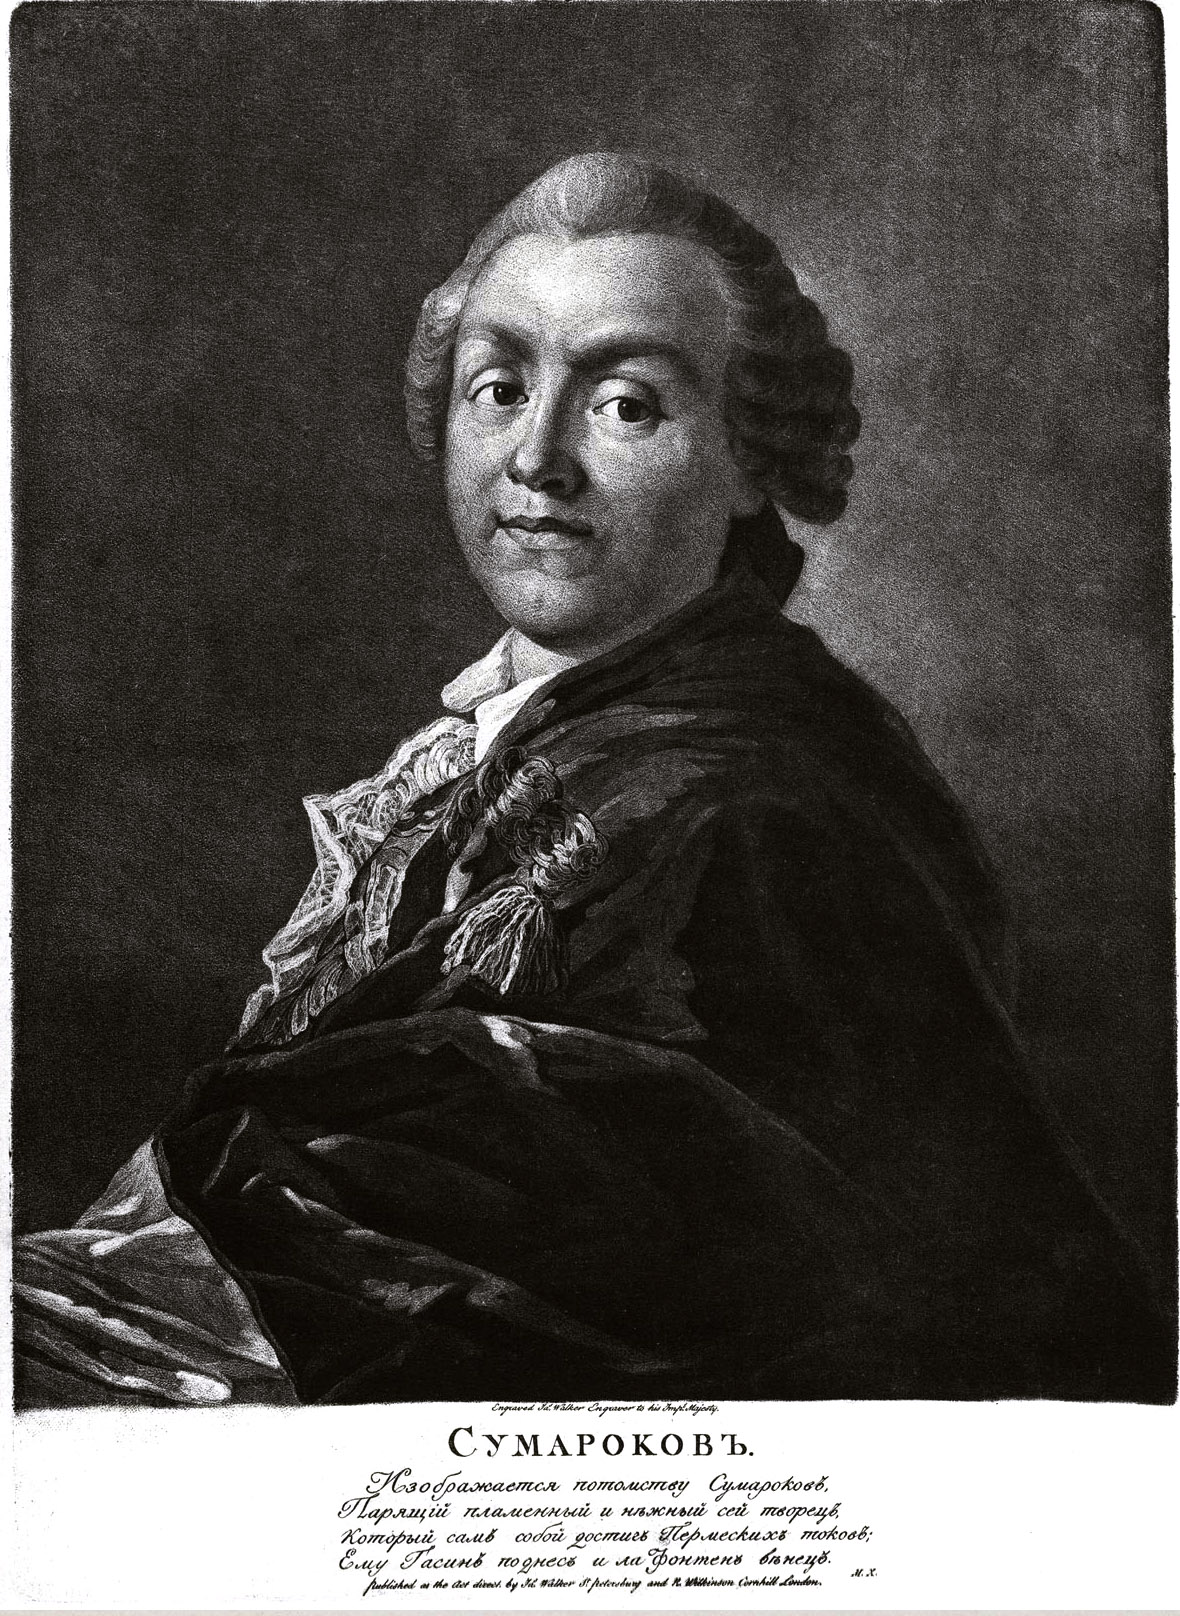 282. Сумароков, Александр Петрович (Оригинал Лосенки, гравюра Валькера).